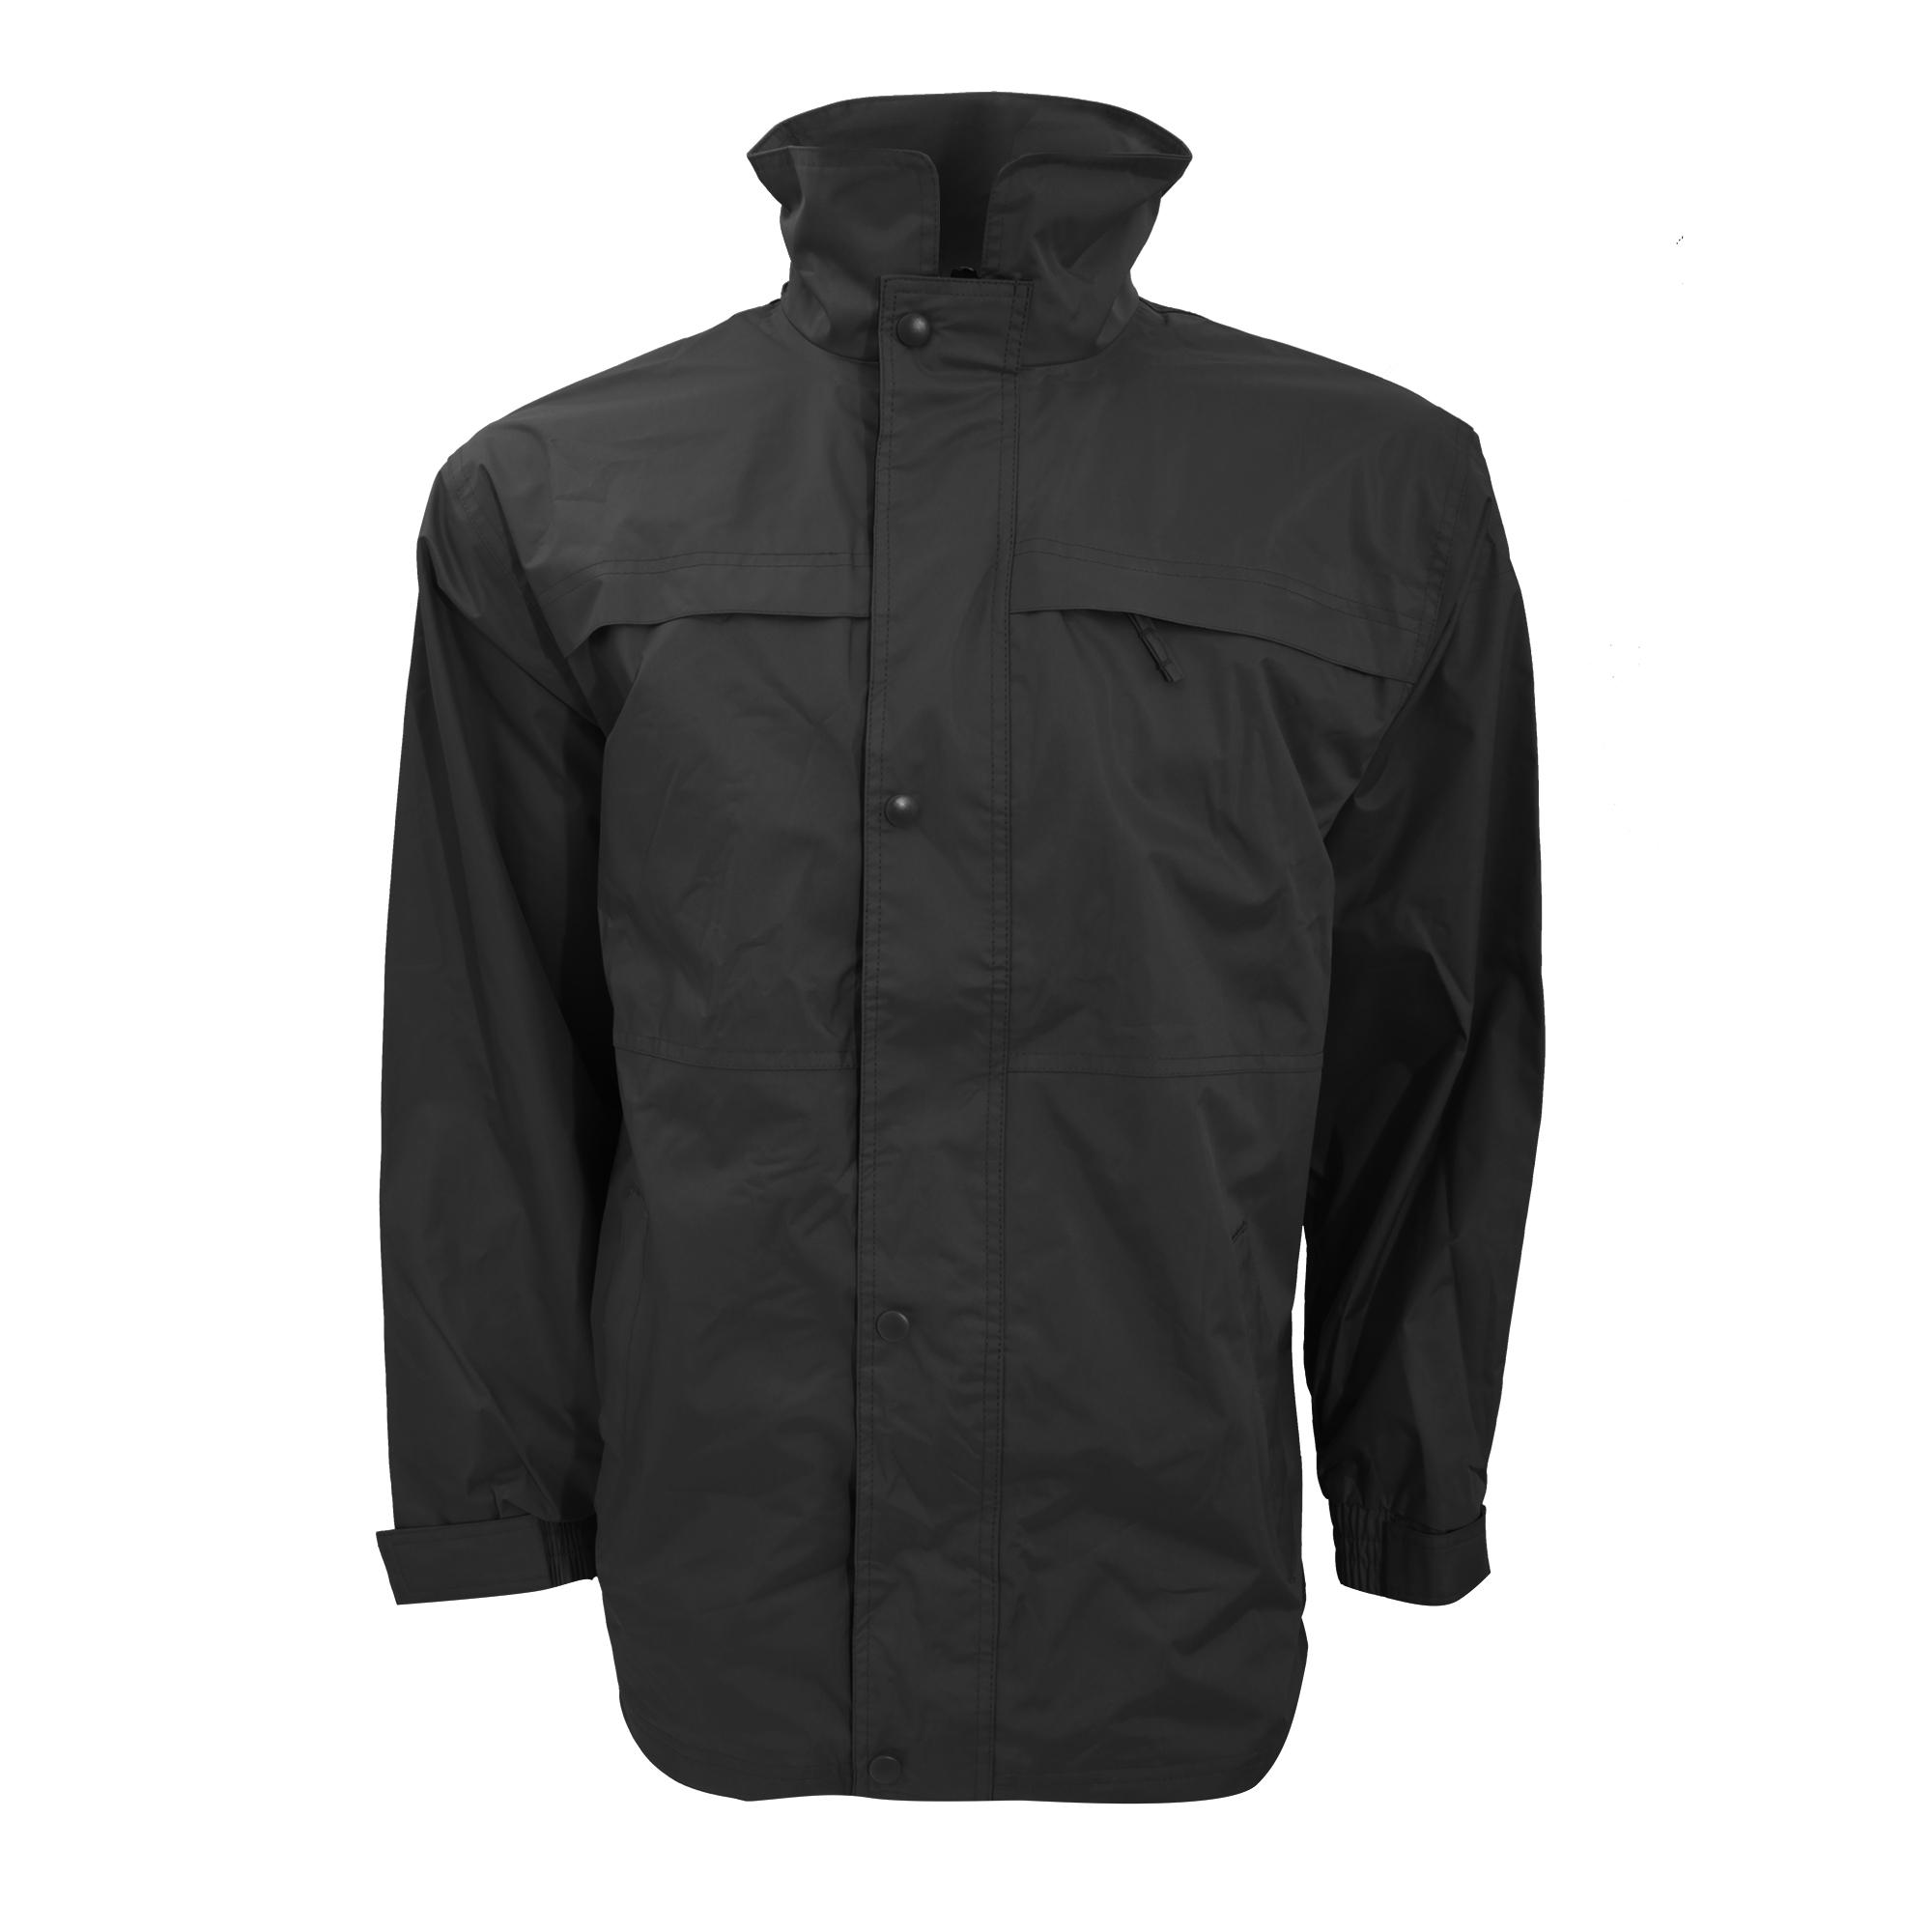 Result Mens Mid-Weight Multi-Function Waterproof Windproof Jacket (2XL) (Black/Grey)